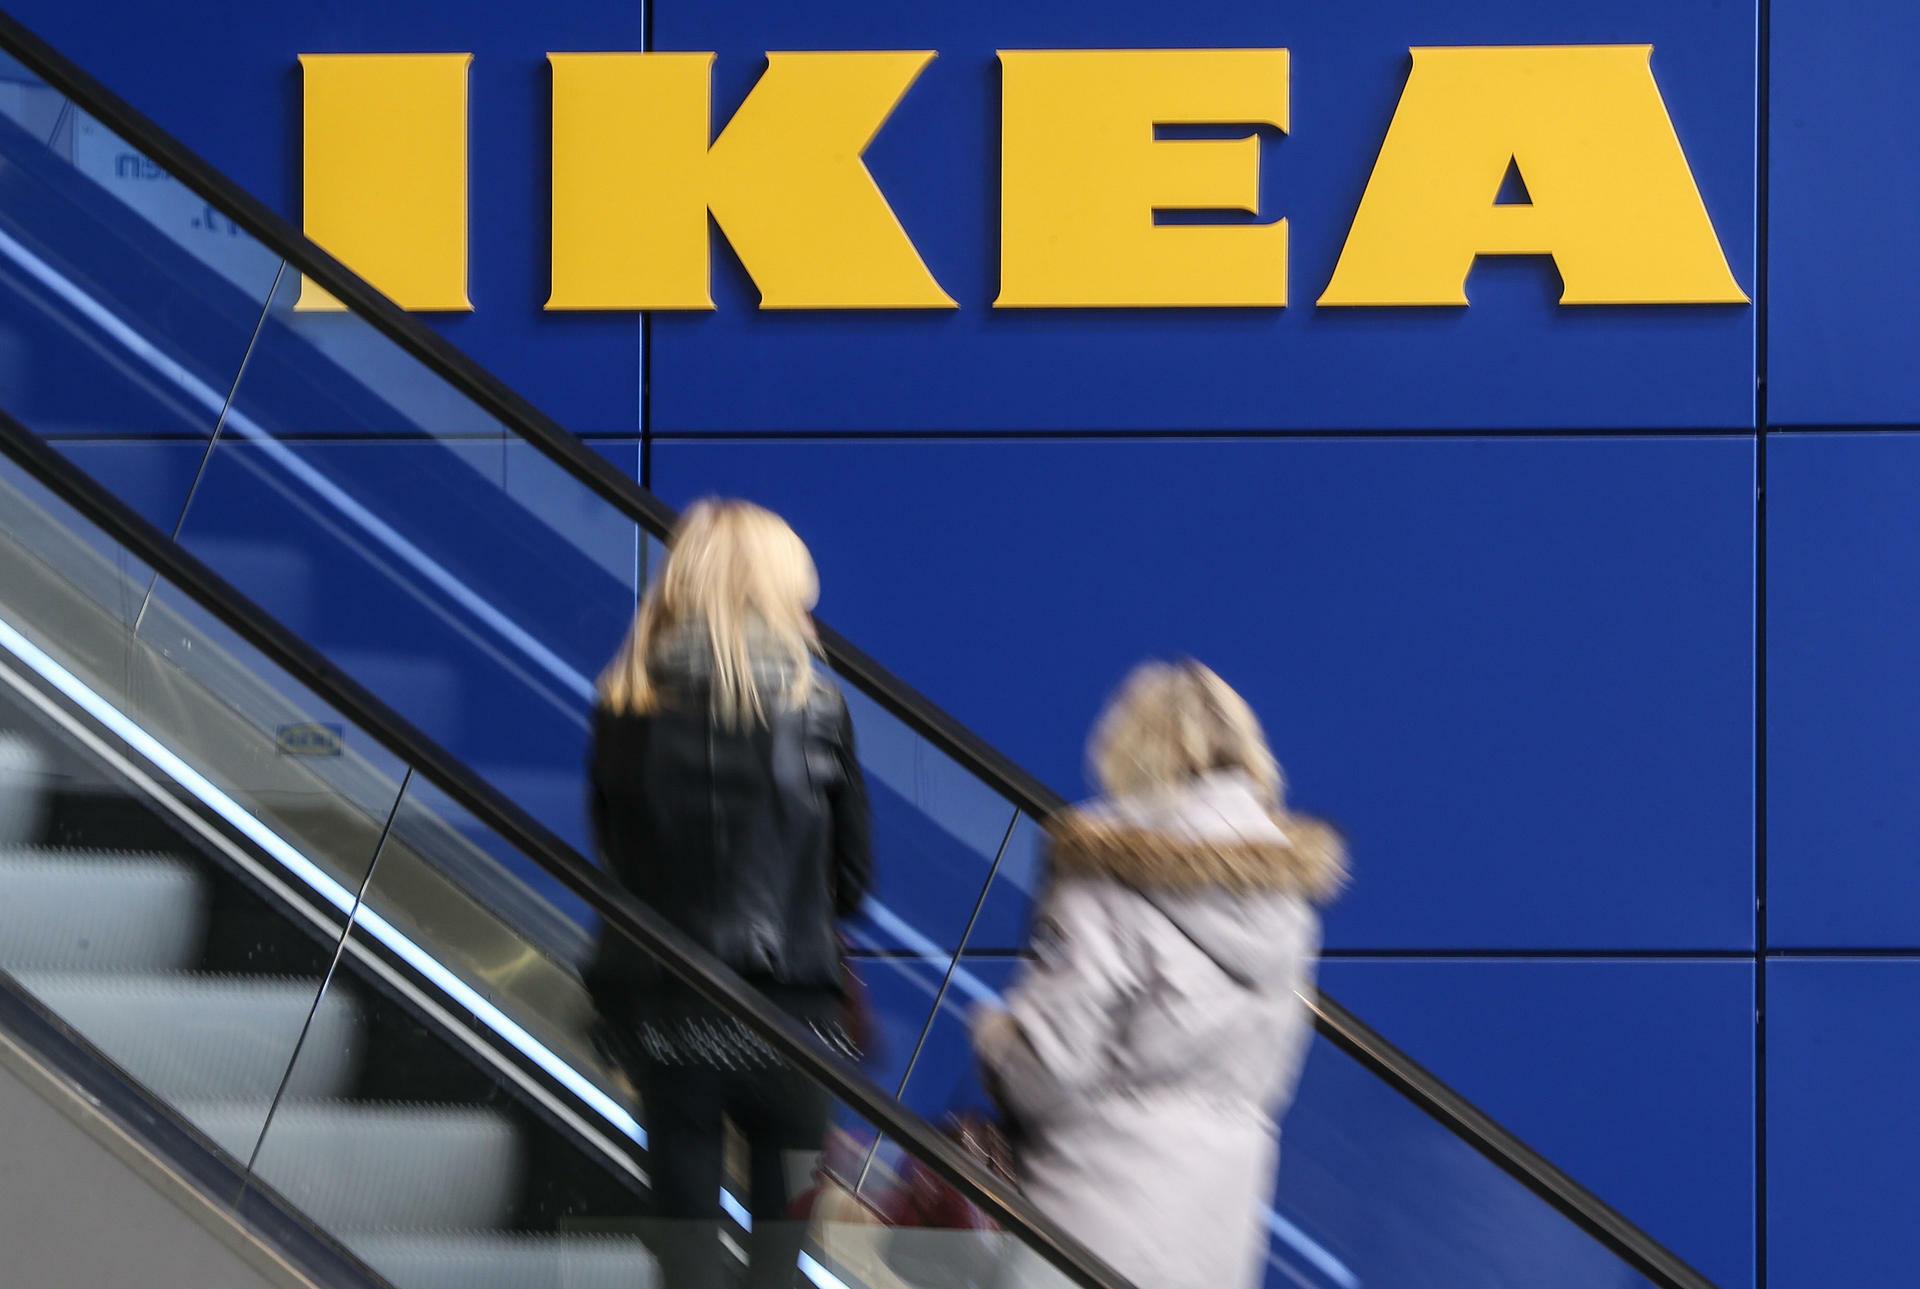 Filiale In Hamburg Altona Ikea Drängt Es In Die Innenstadt